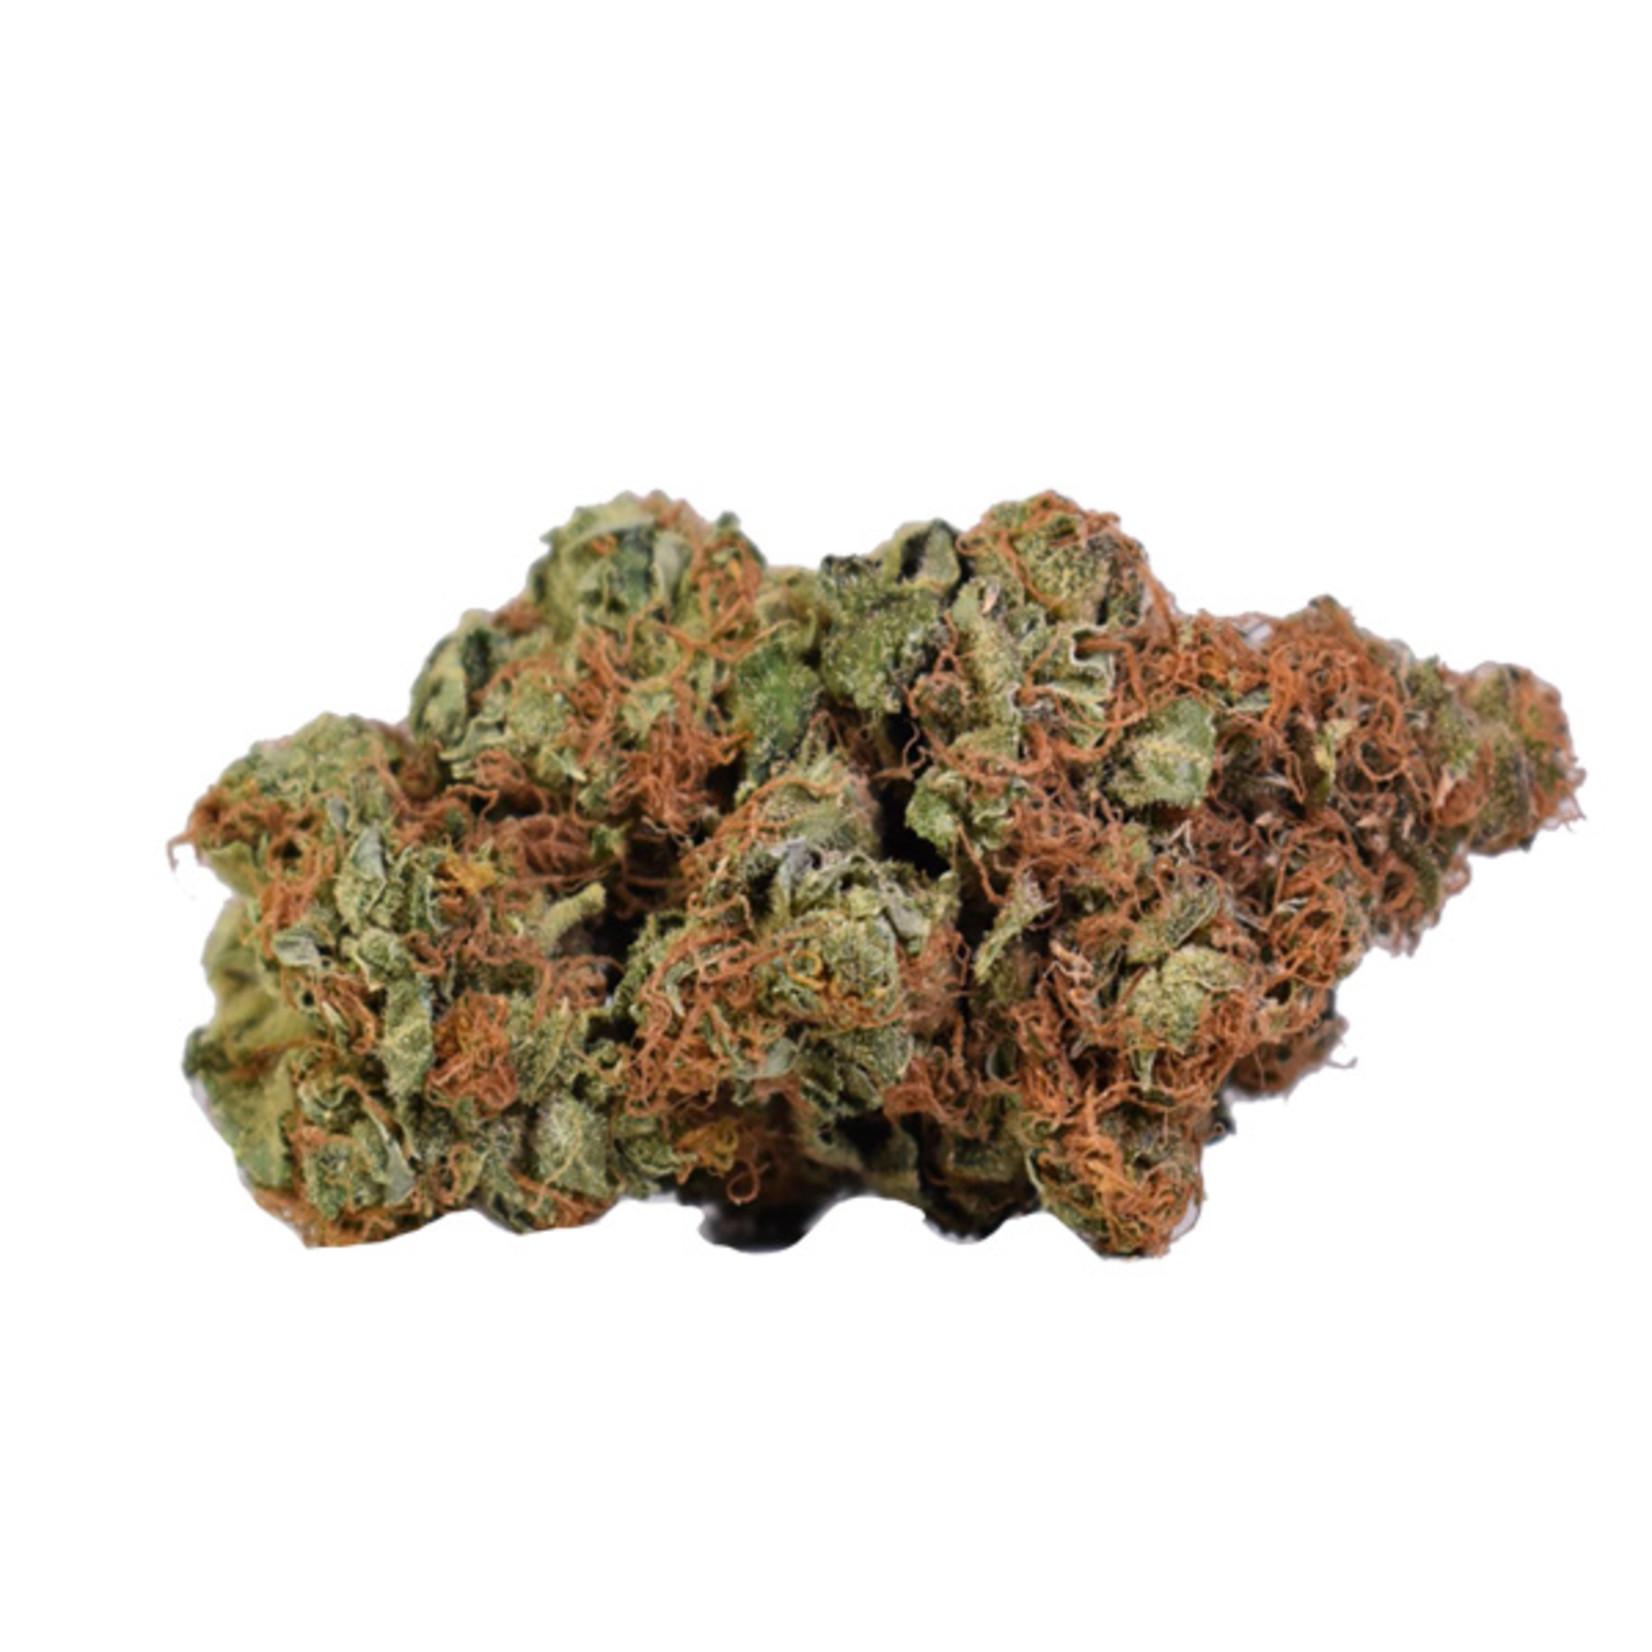 Banana Sherbet cannabis seeds